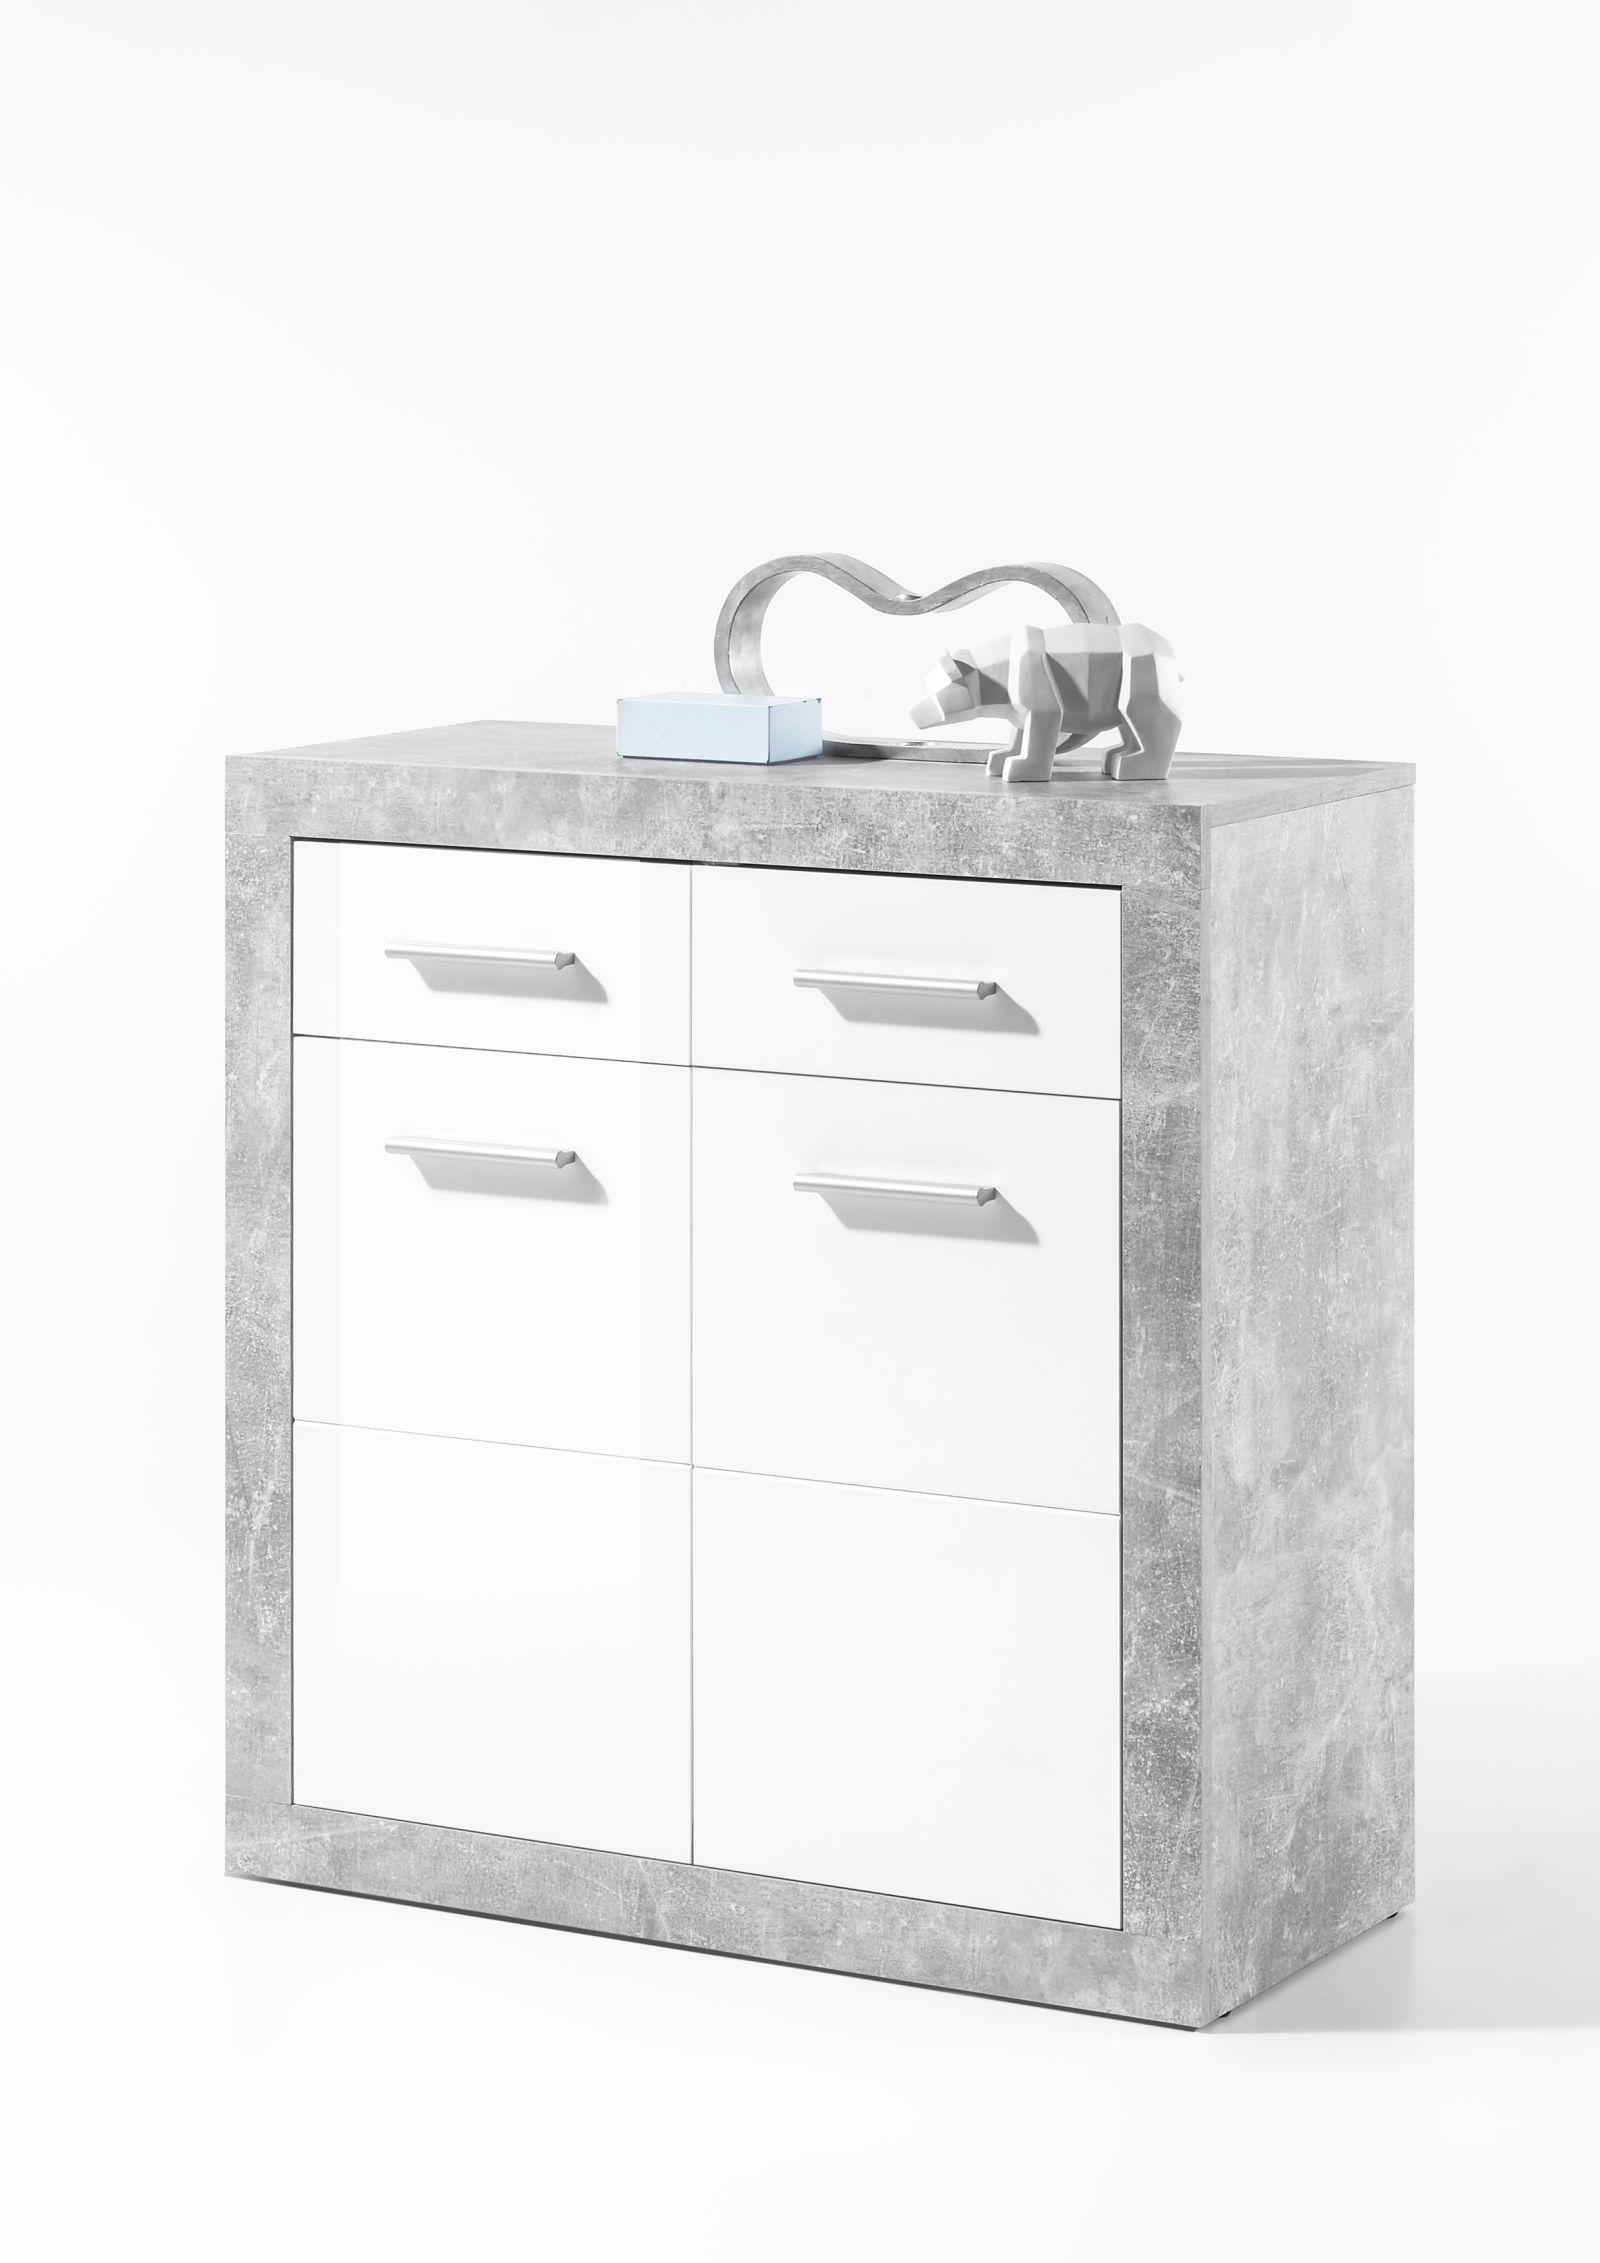 kommode 1 stone kommoden kleinm bel garderoben. Black Bedroom Furniture Sets. Home Design Ideas